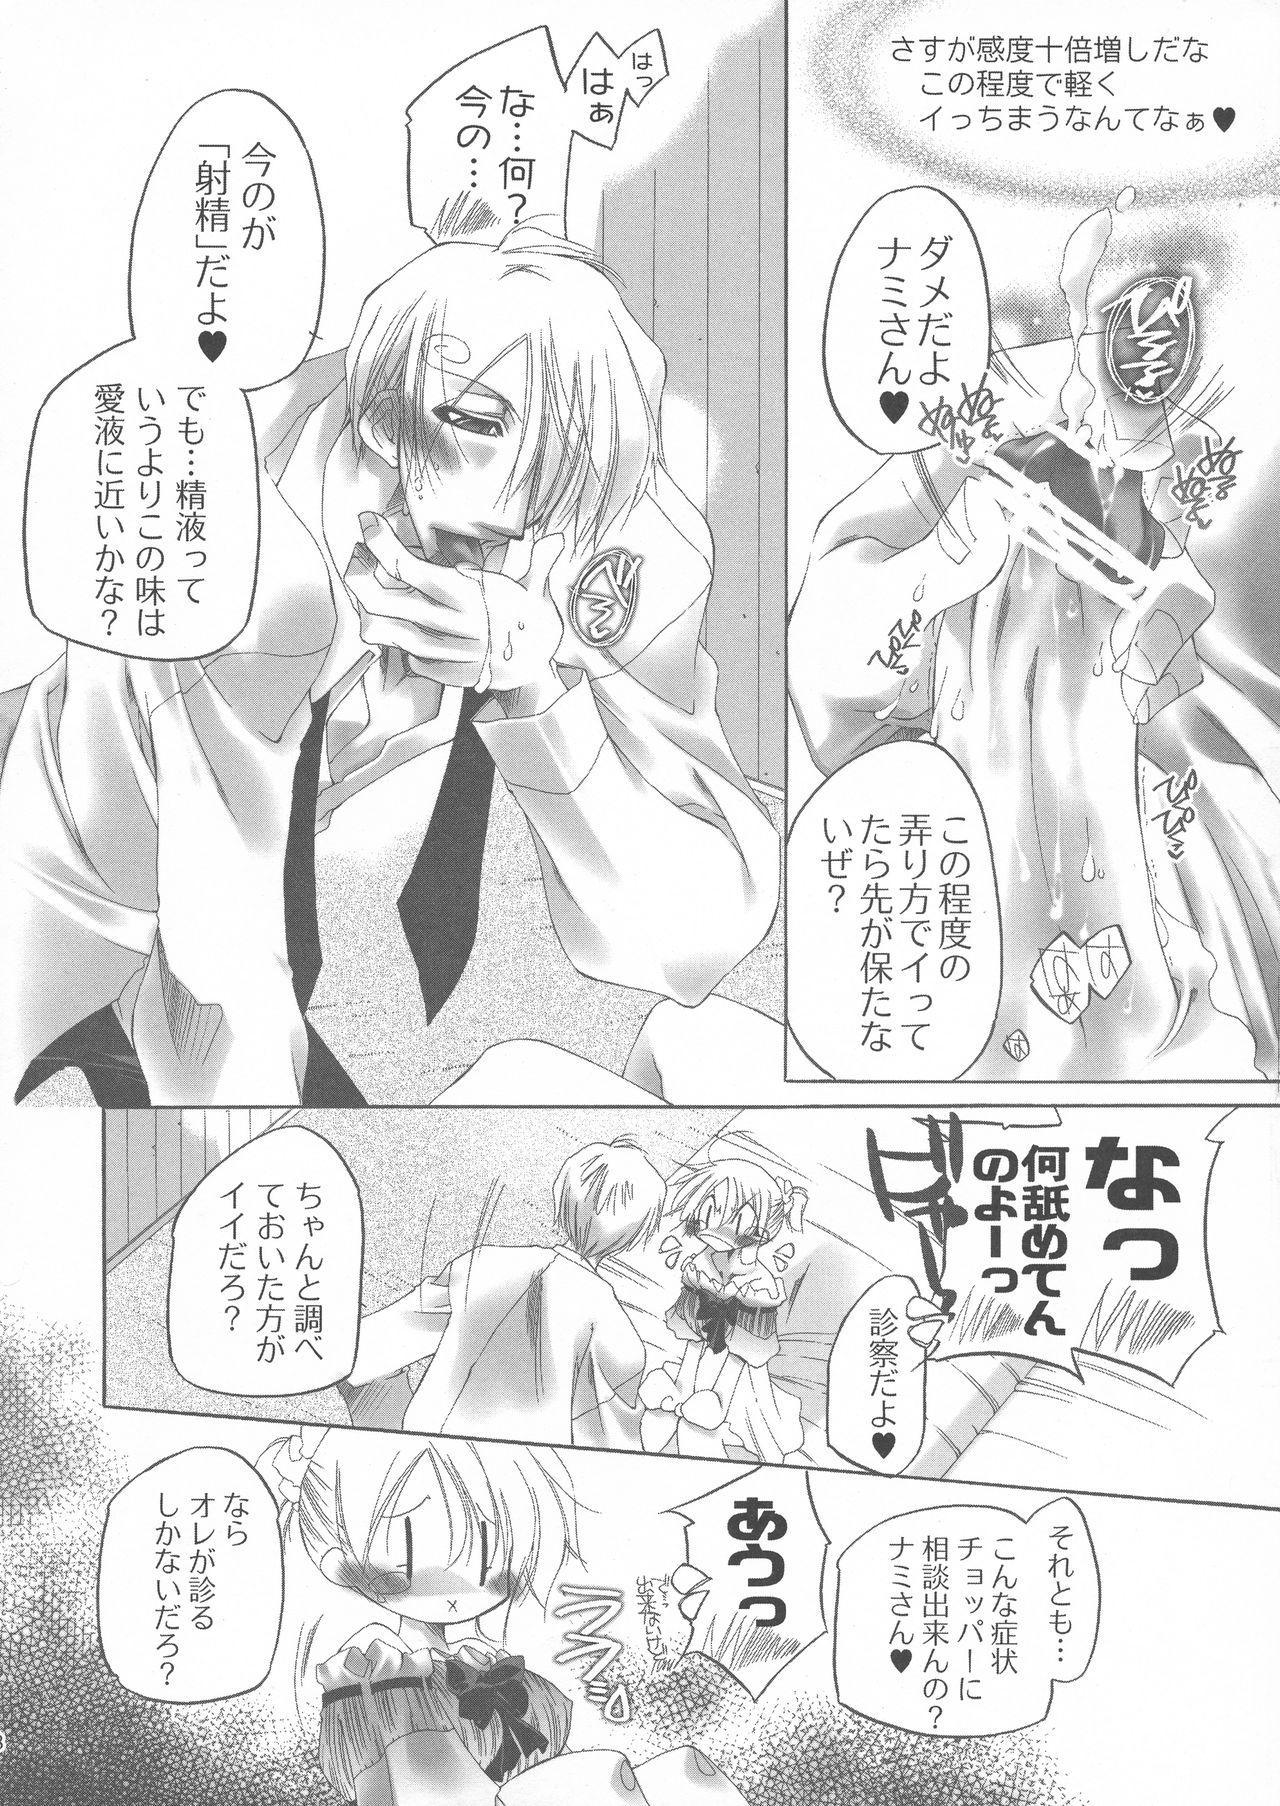 Futanari hime 16